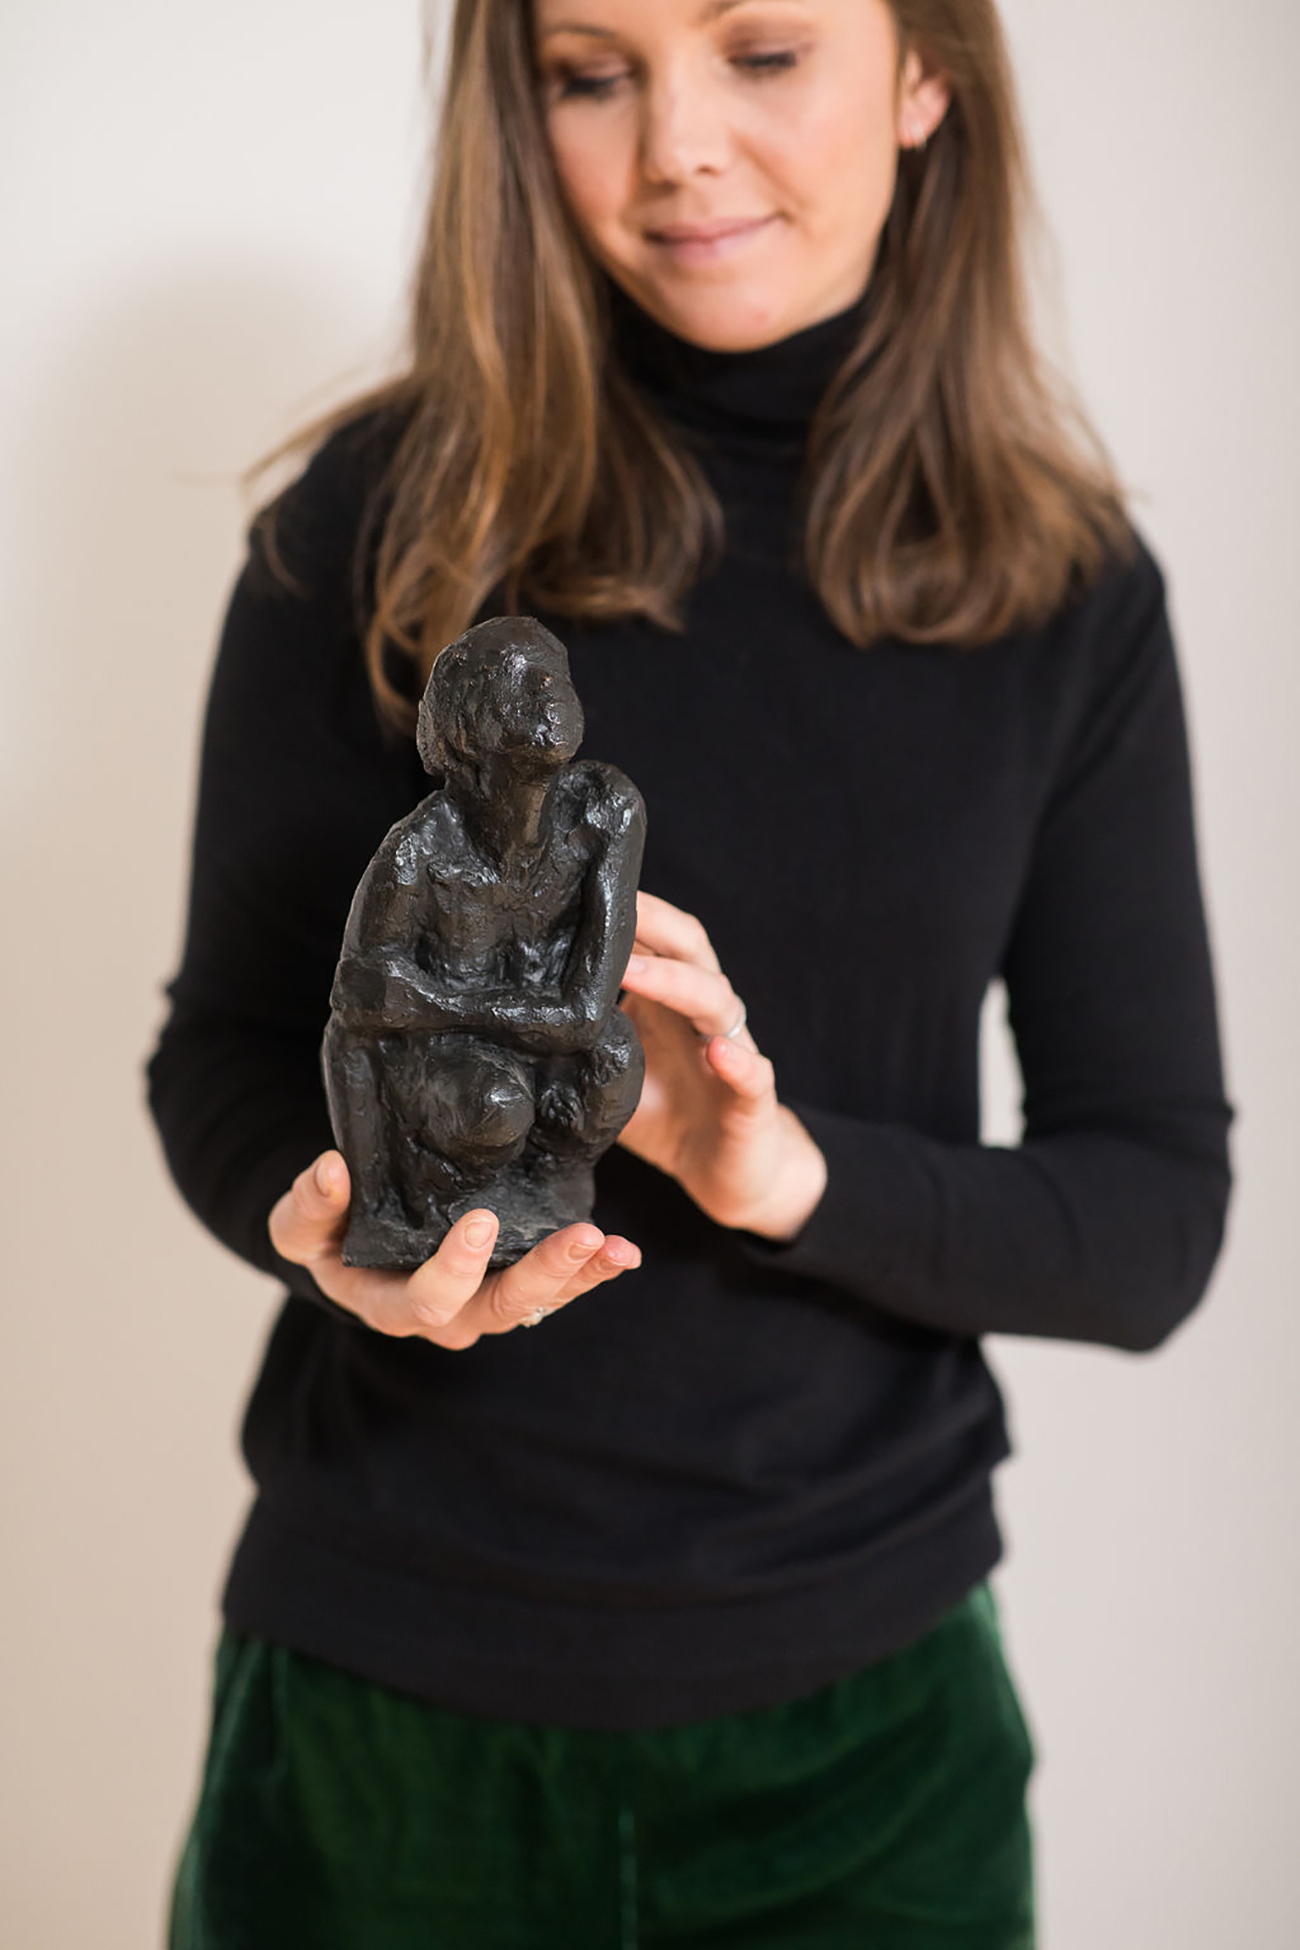 Anne De Mol sculpture bronze woman Alexia Werrie Gallery Art in a House Tervuren Brussels Belgium